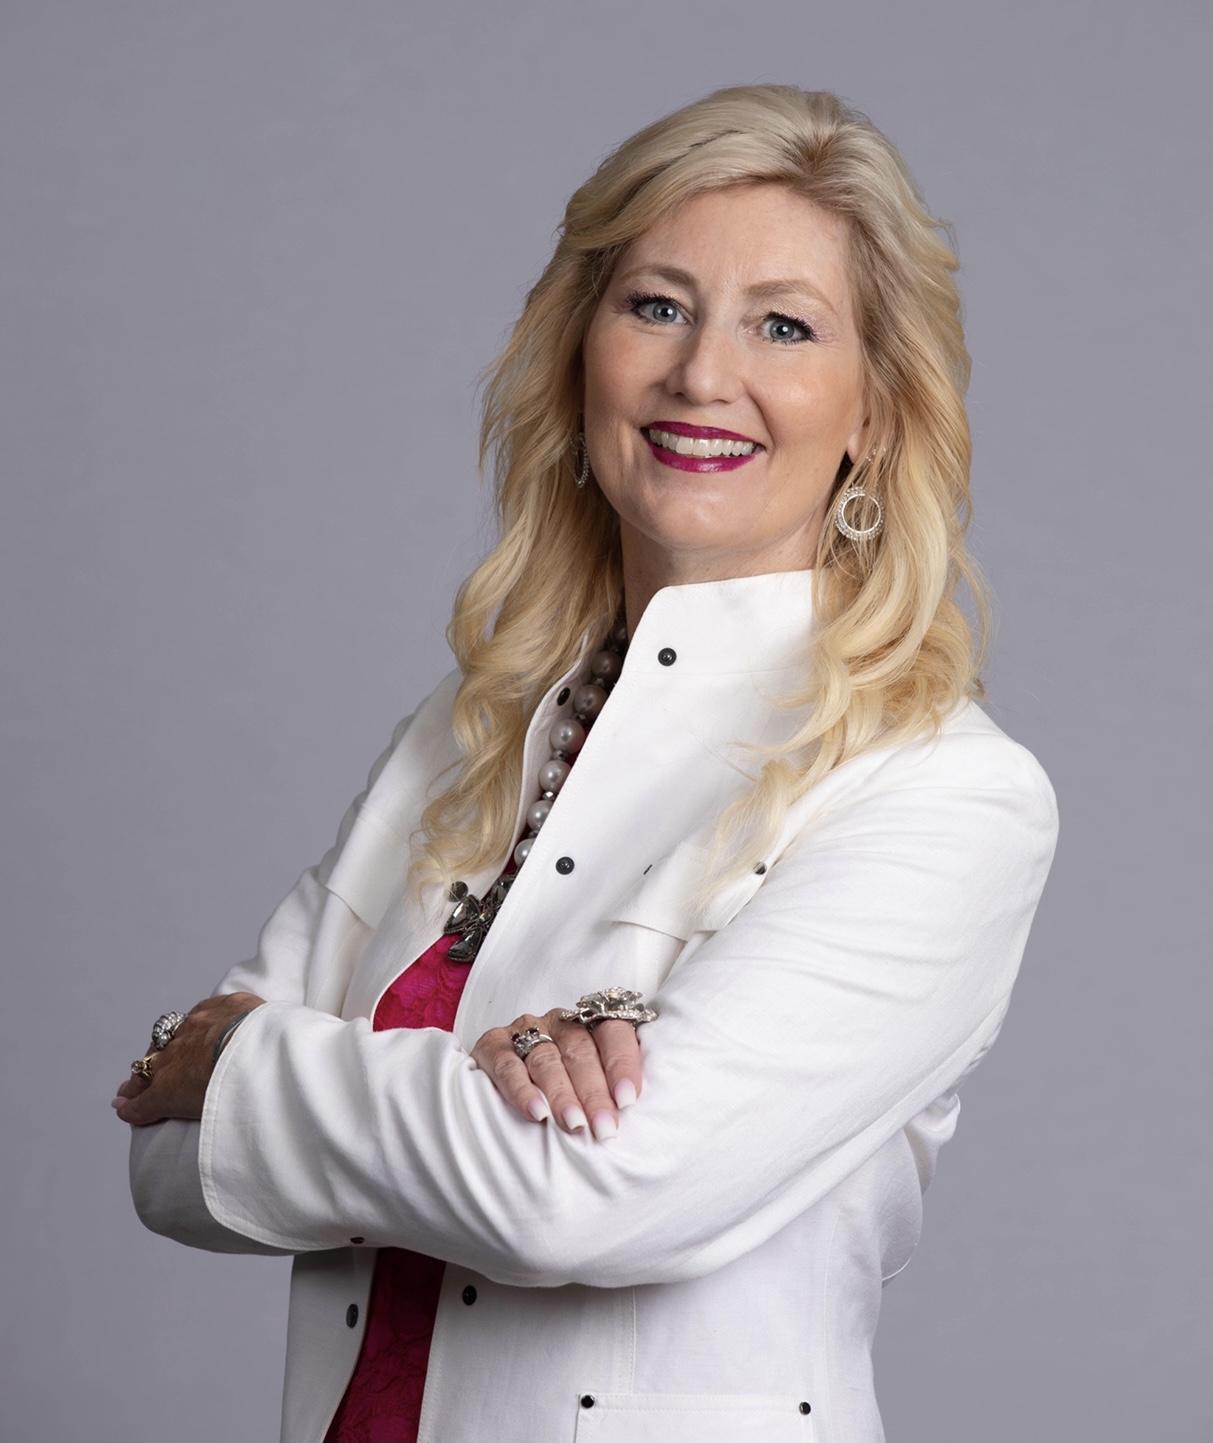 Dr. Candice Smithyman